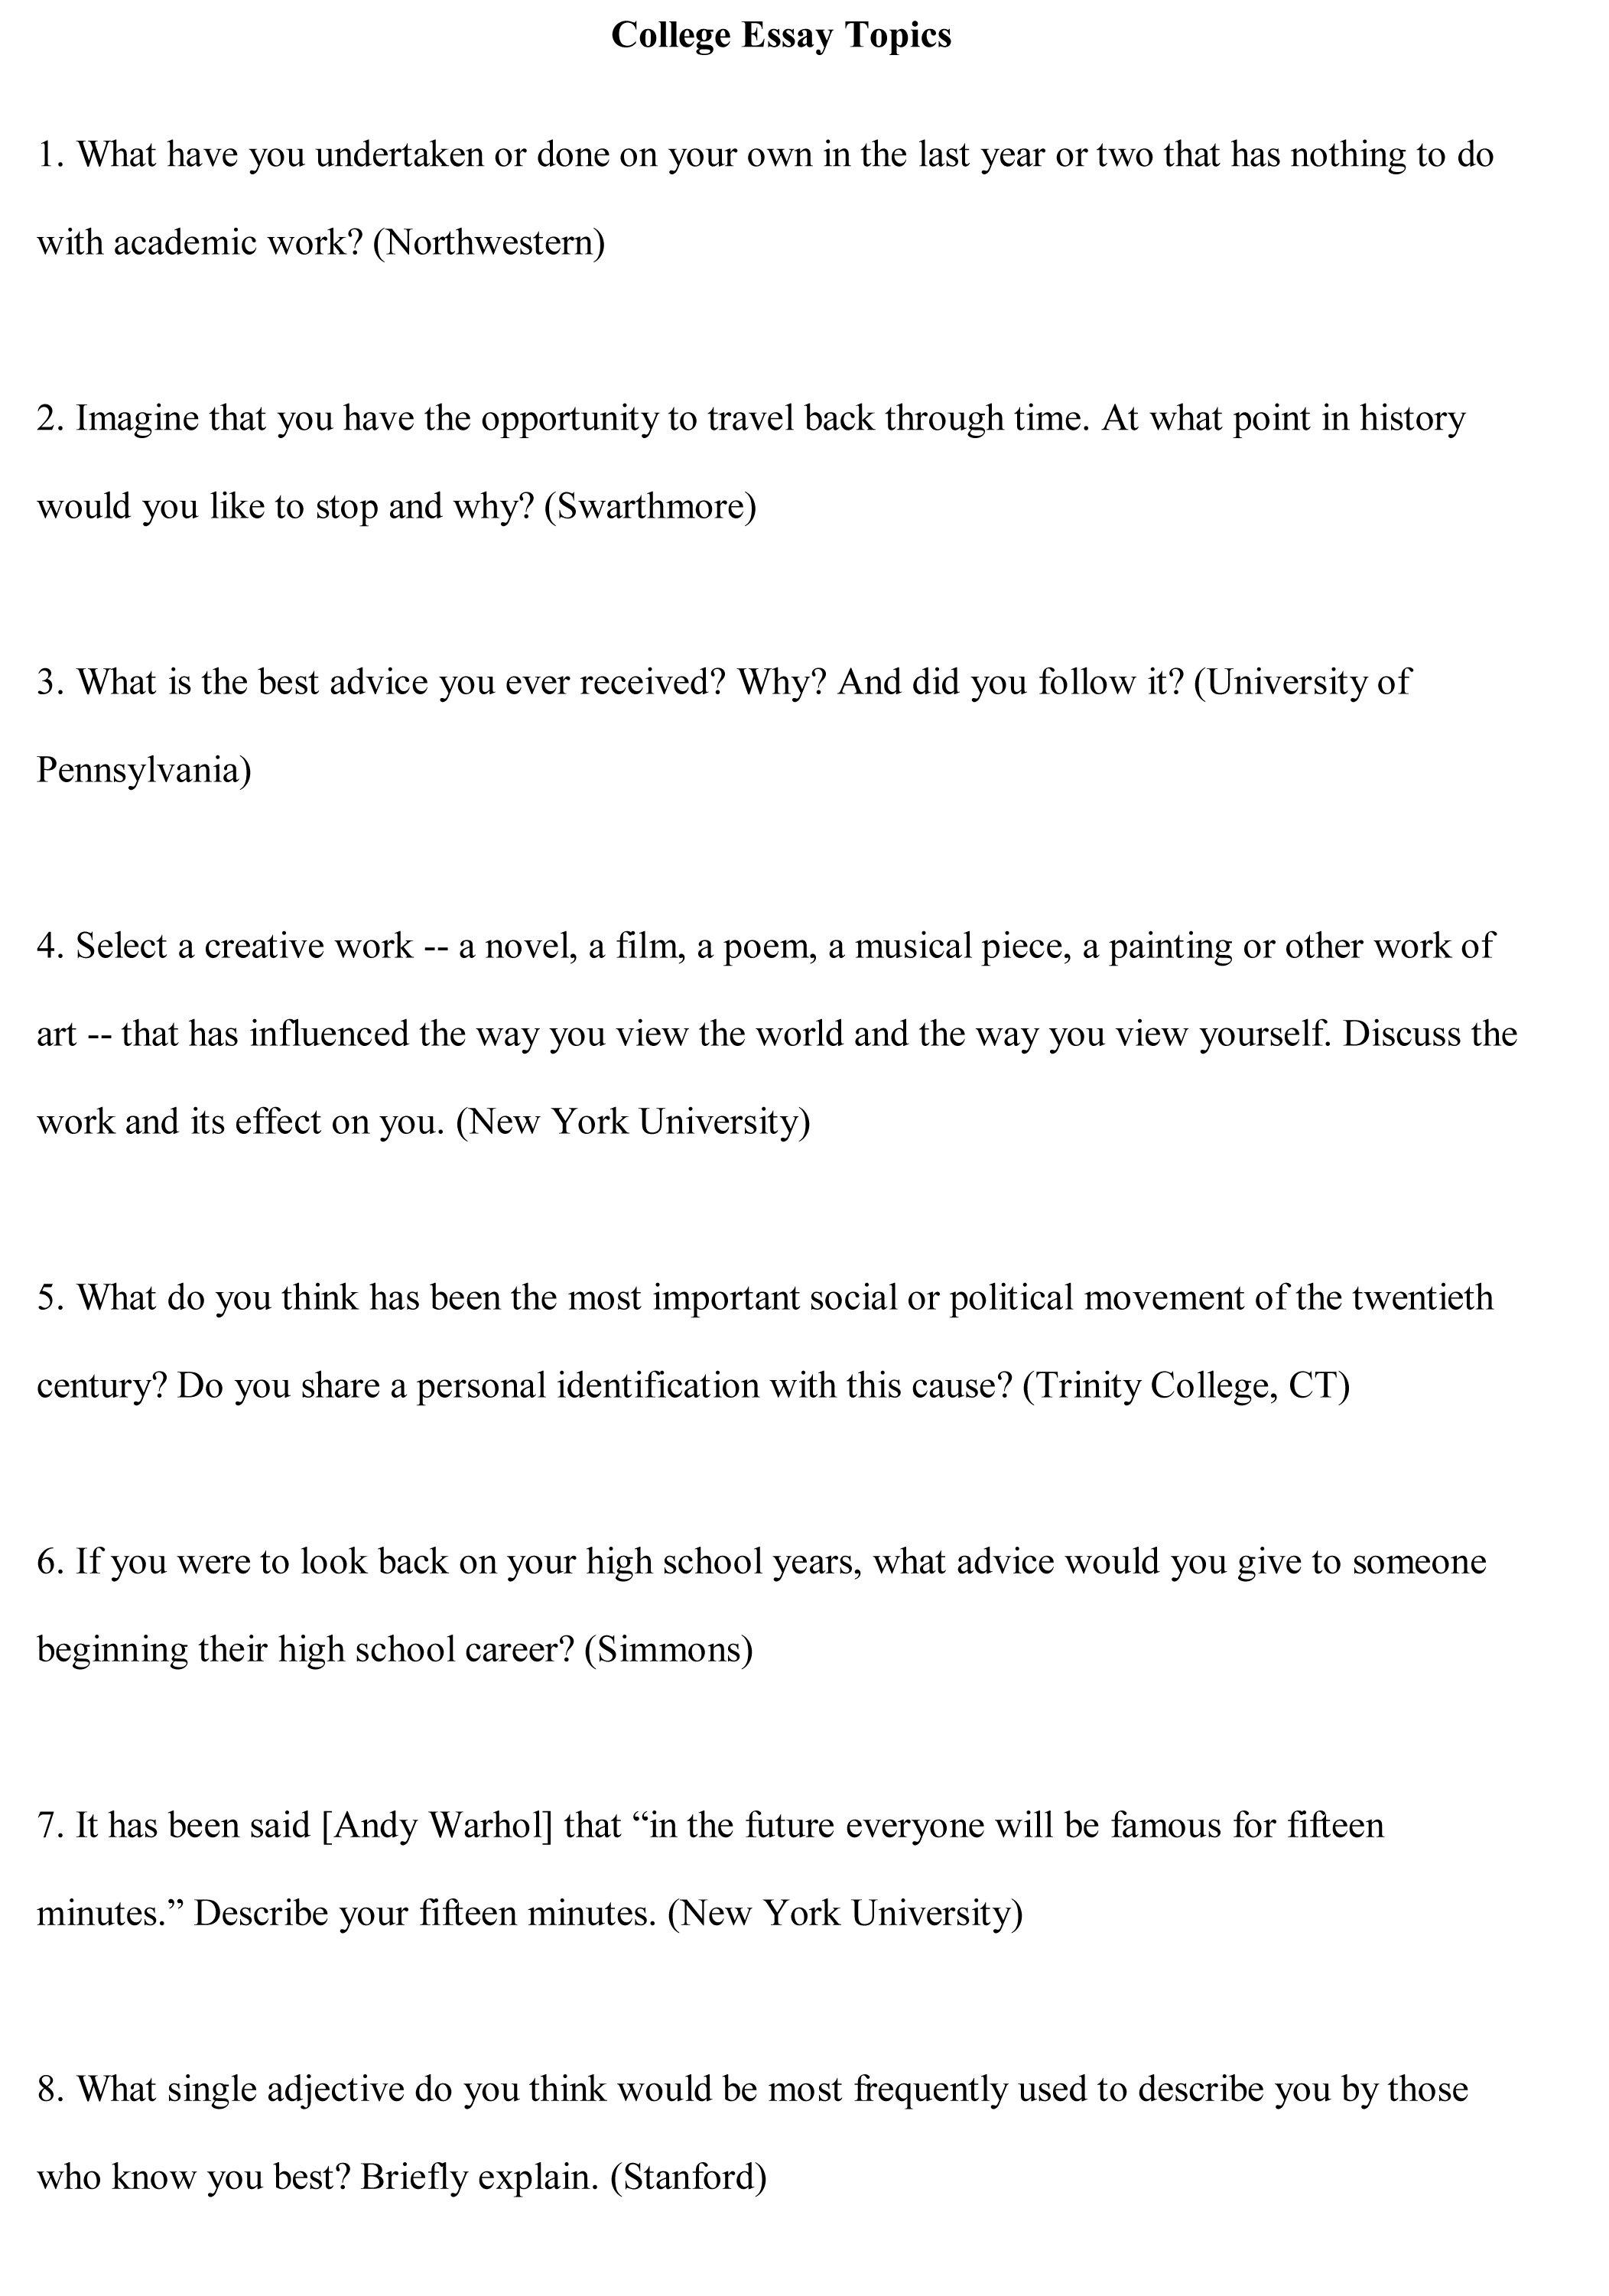 topics to do a speech on